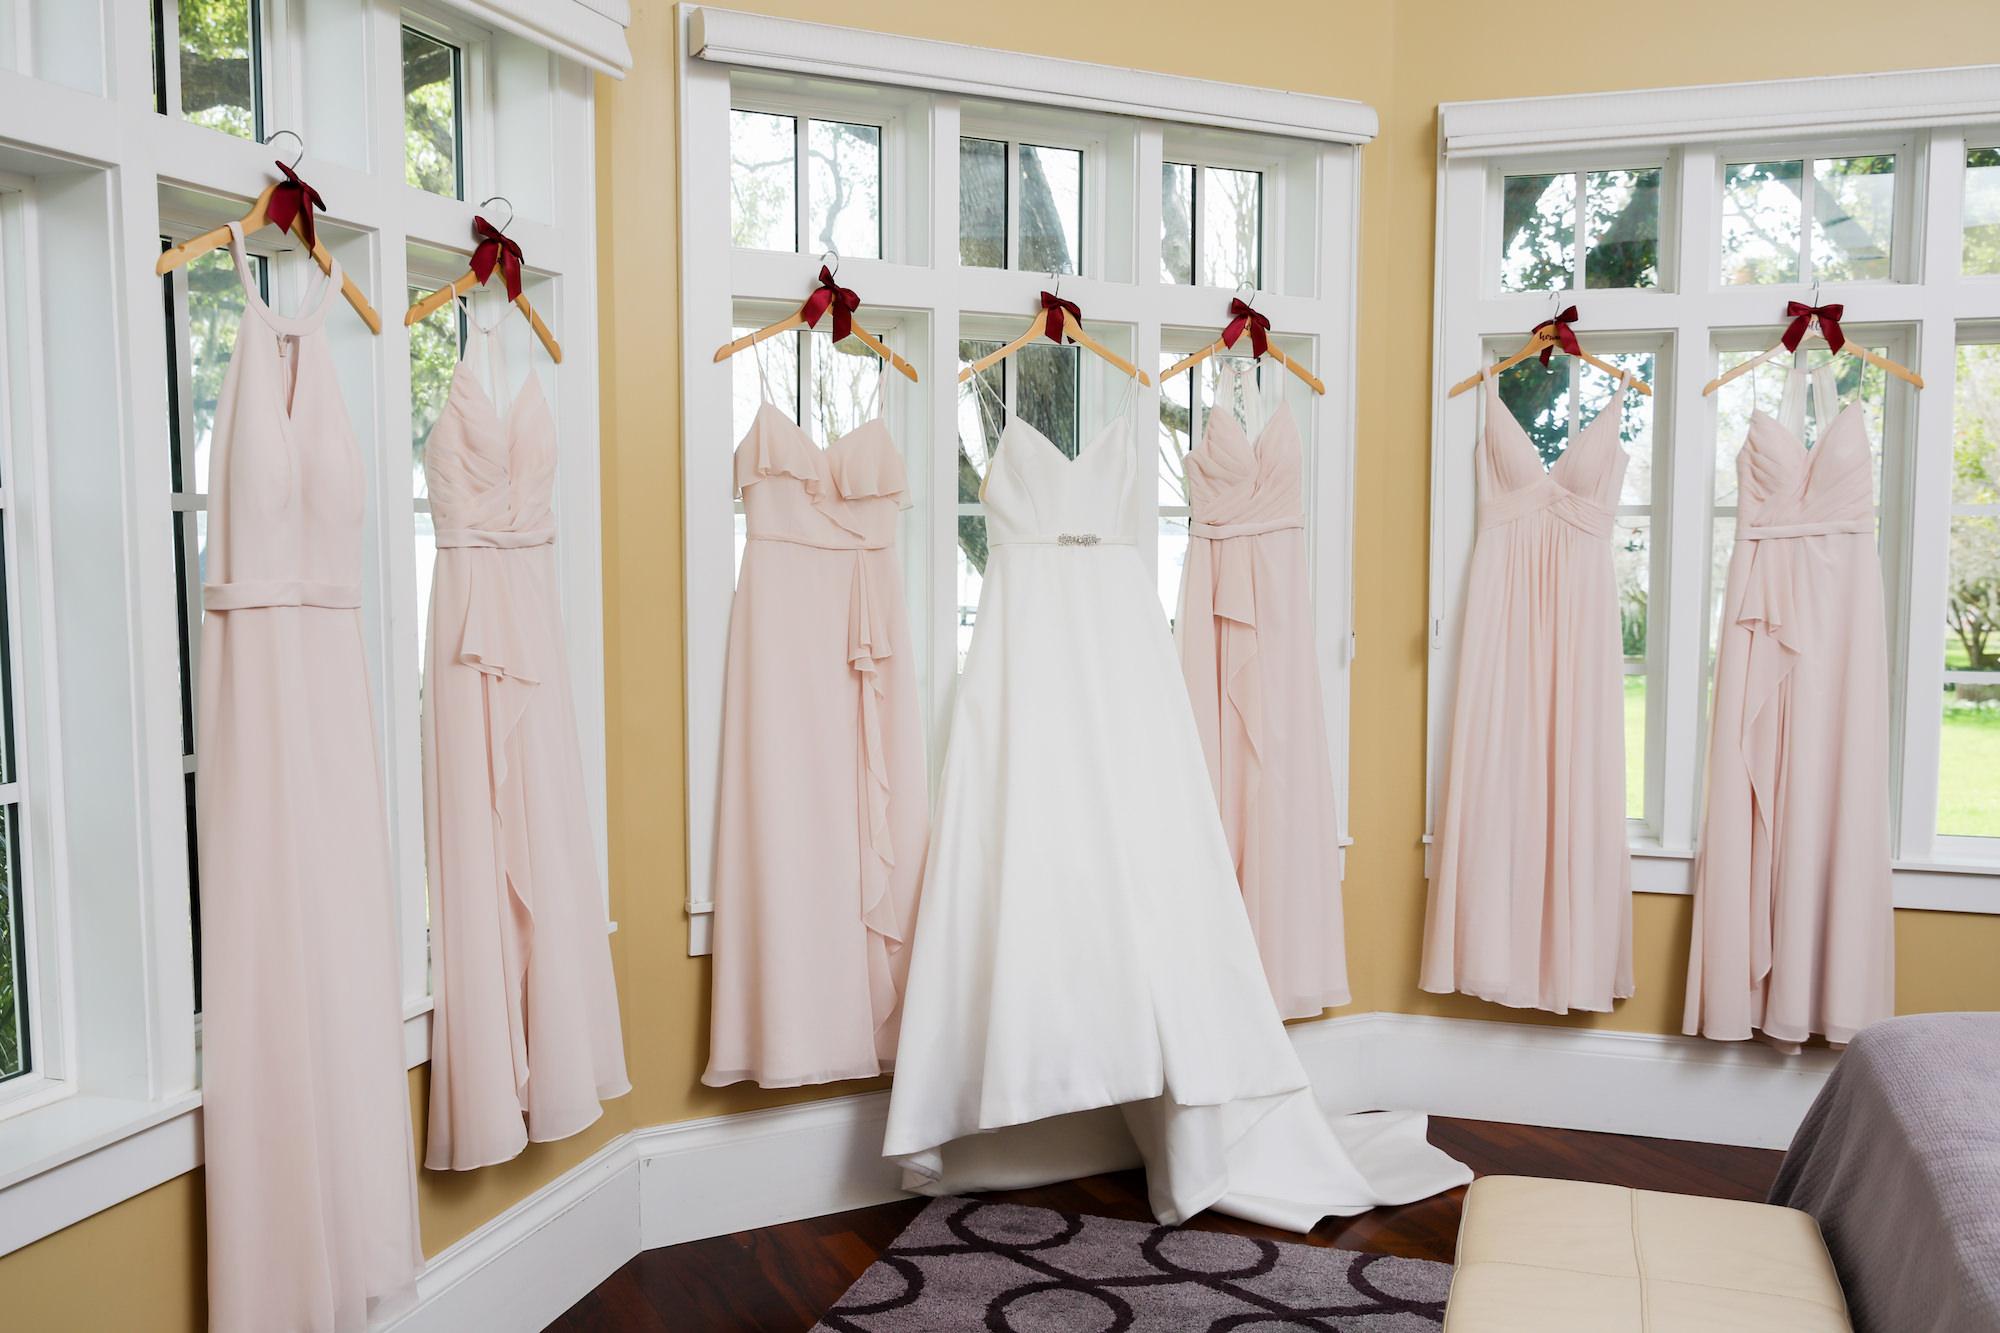 Classic A-Line V Neck with Straps and Rhinestone Belt Justin Alexander Wedding Dress, Blush Pink Mix and Match Azazie Bridesmaid Dresses